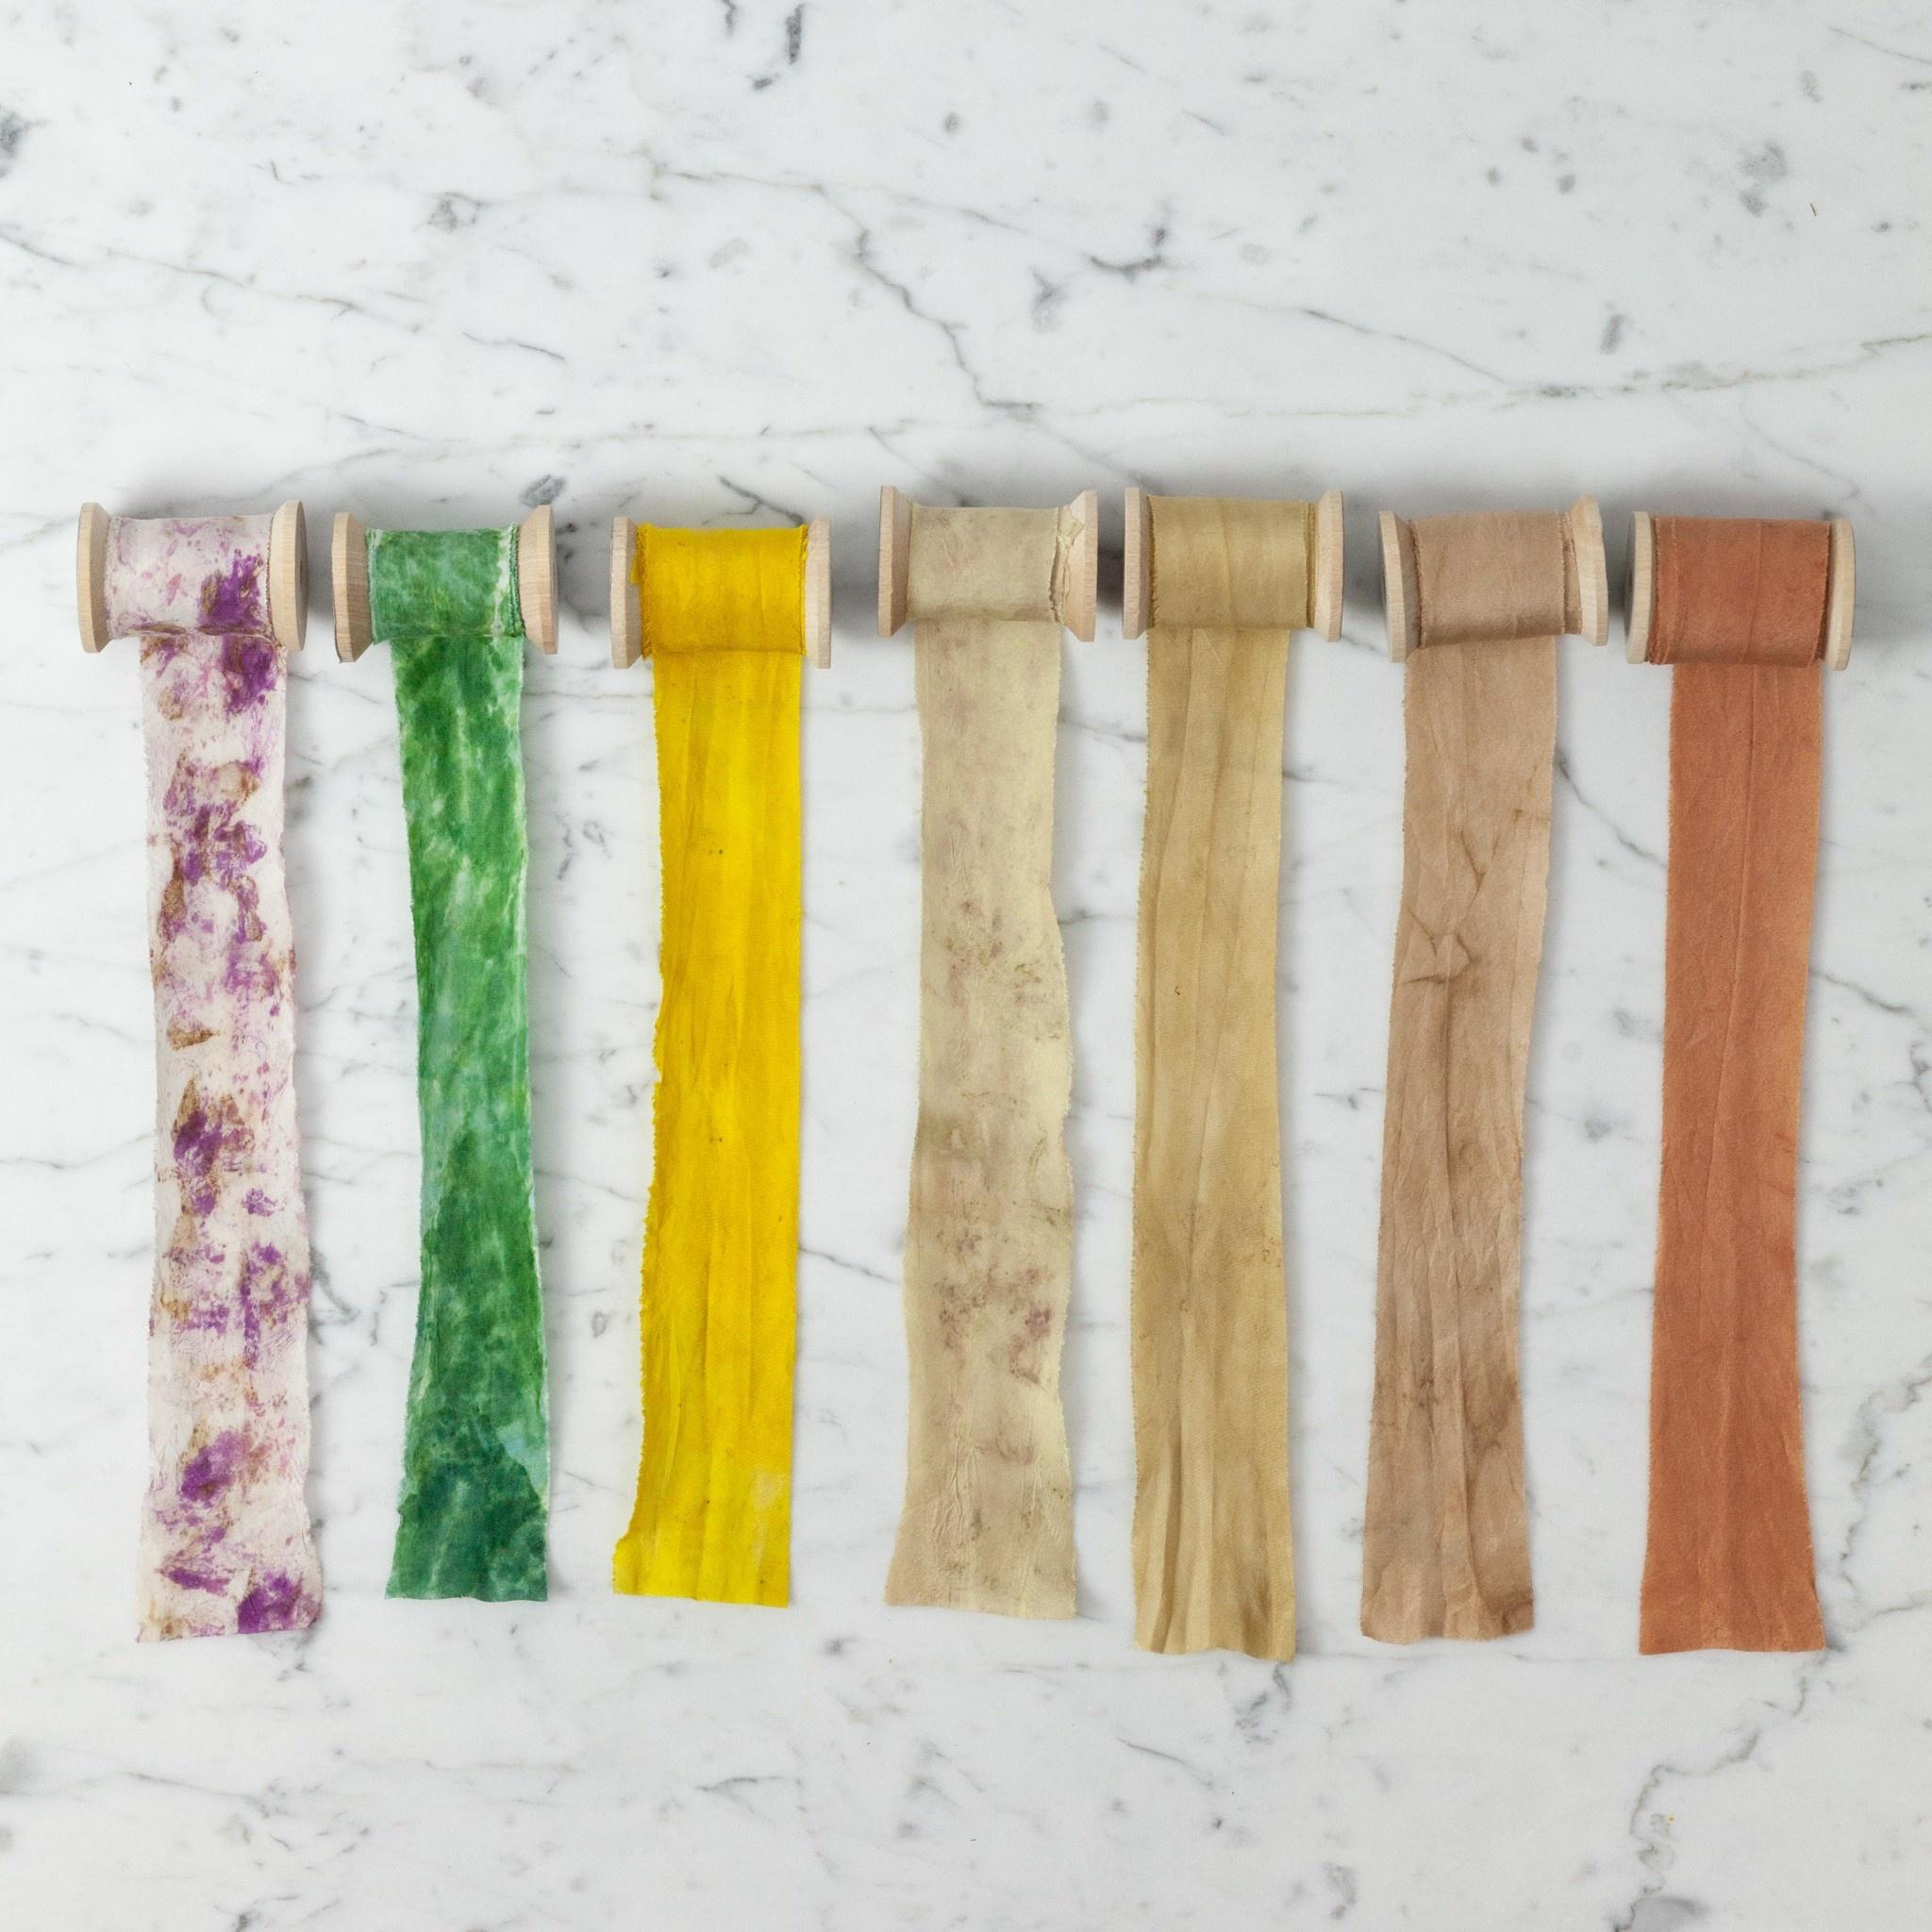 Northern Dyer Northern Dyer Natural Dye Silk Ribbon - Black Walnut - 6'